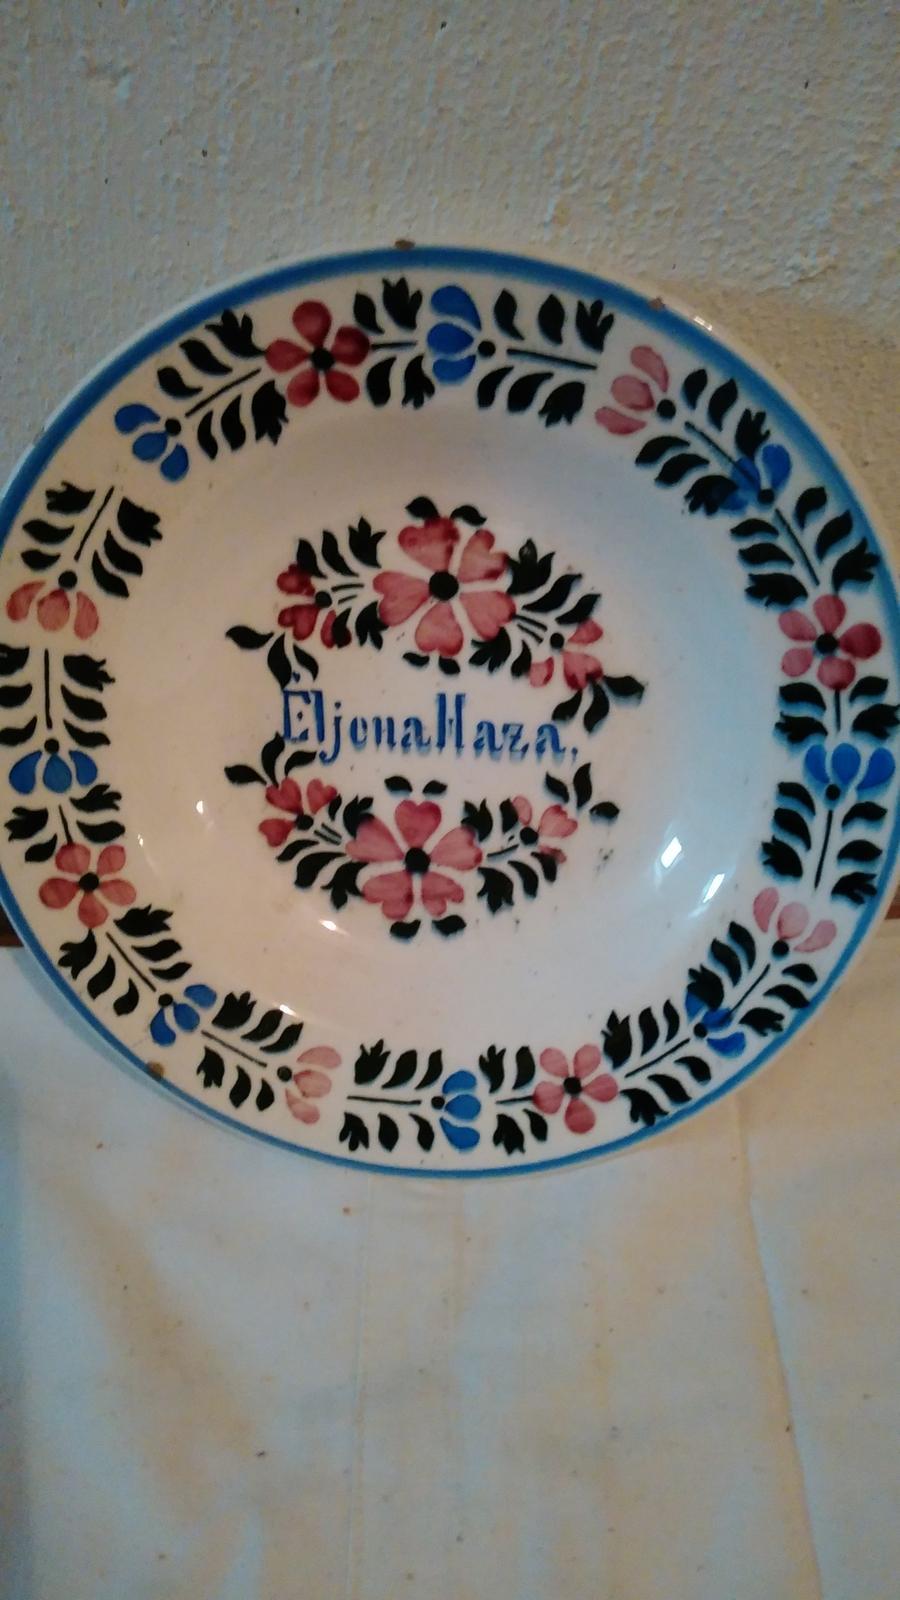 tanier maľovaný eljena haza - Obrázok č. 1